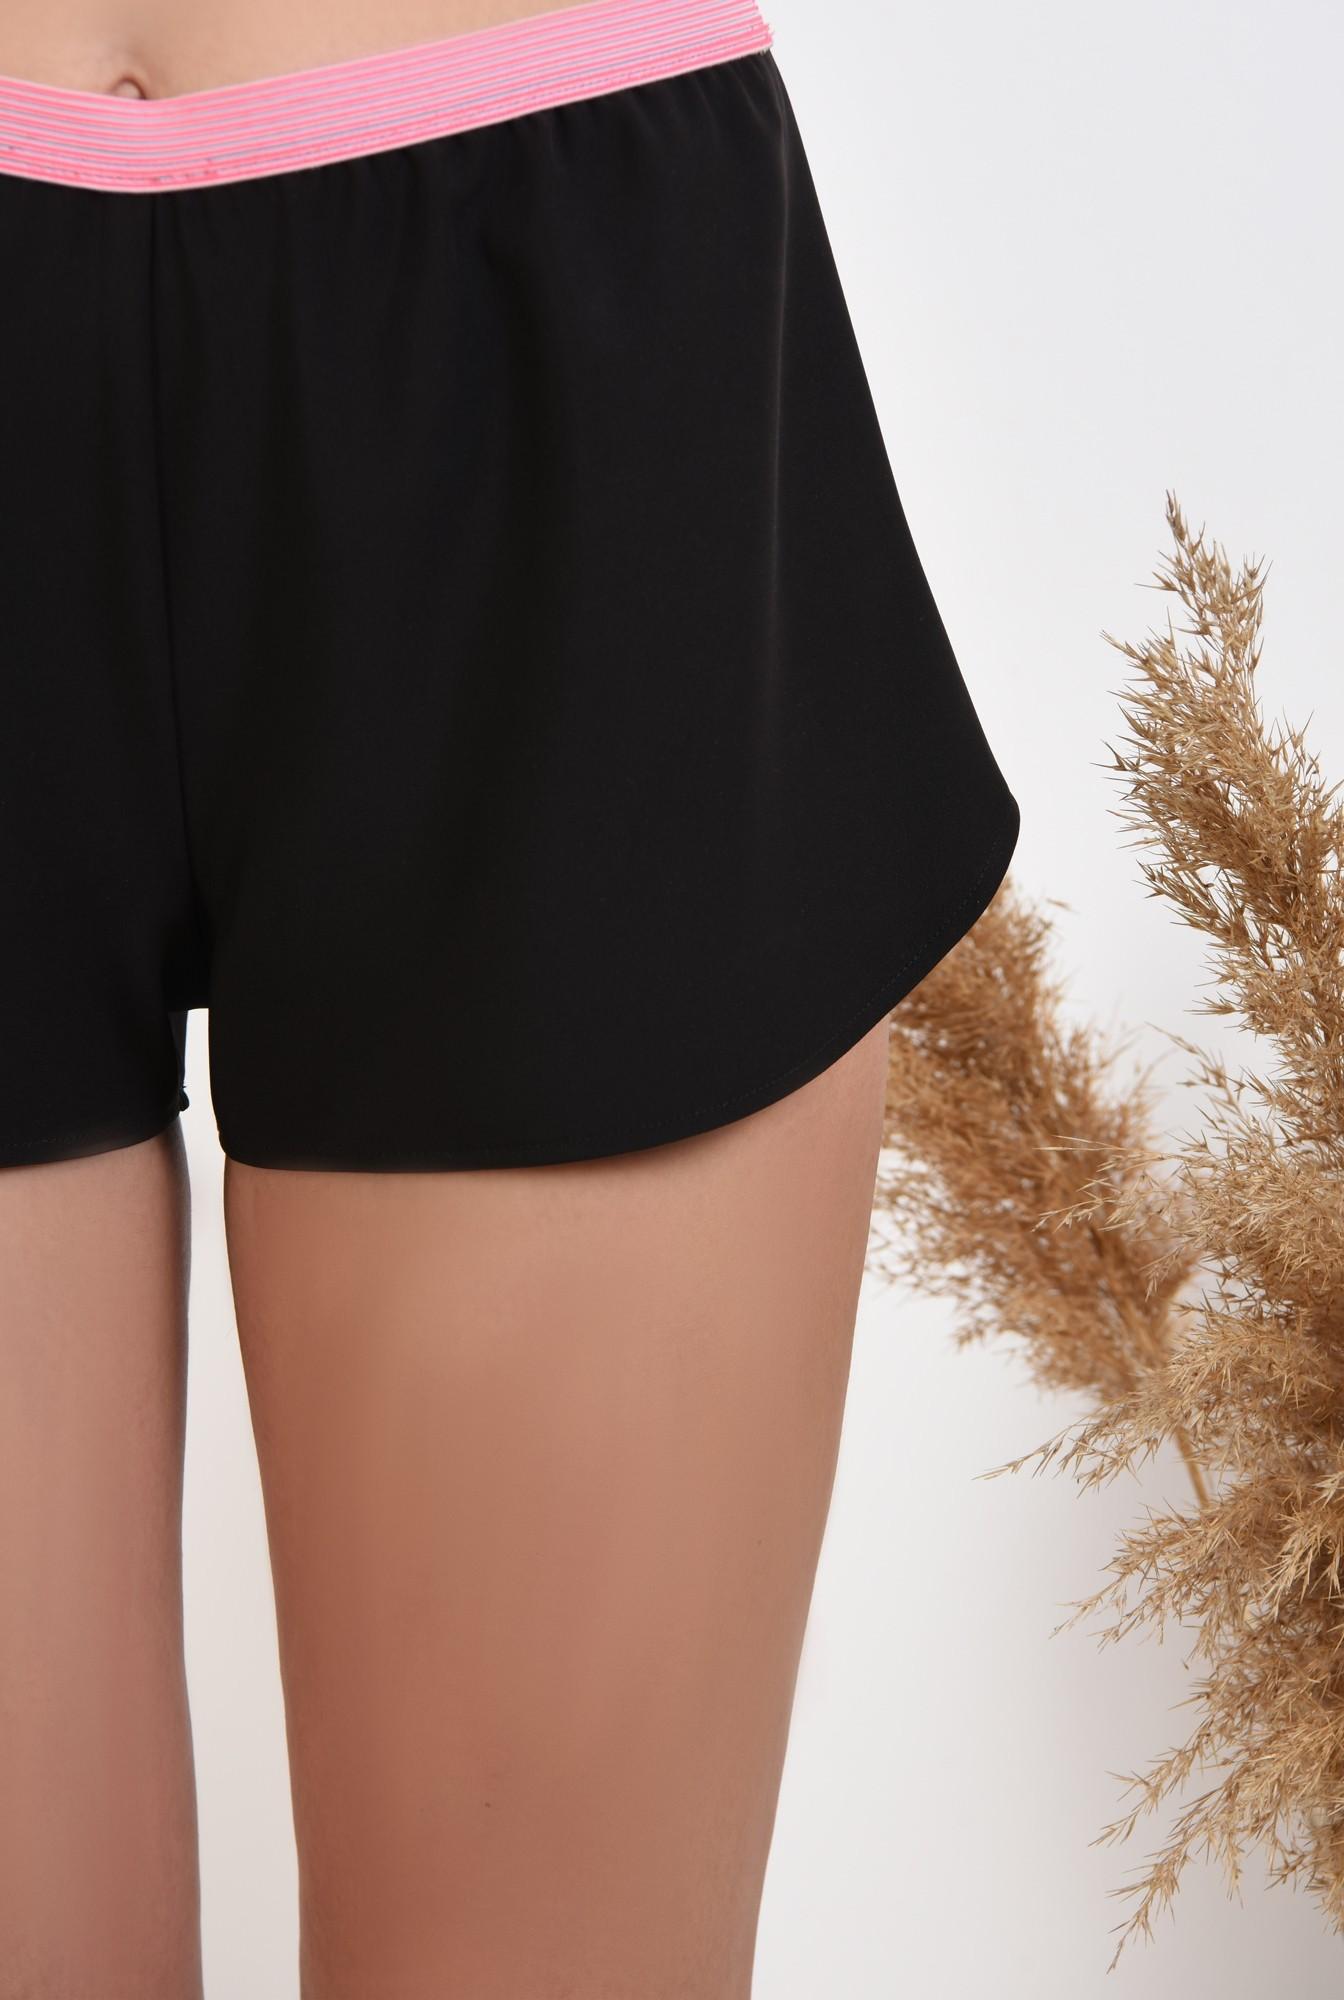 2 - pantaloni scurti, negri, sort, betelie in contrast